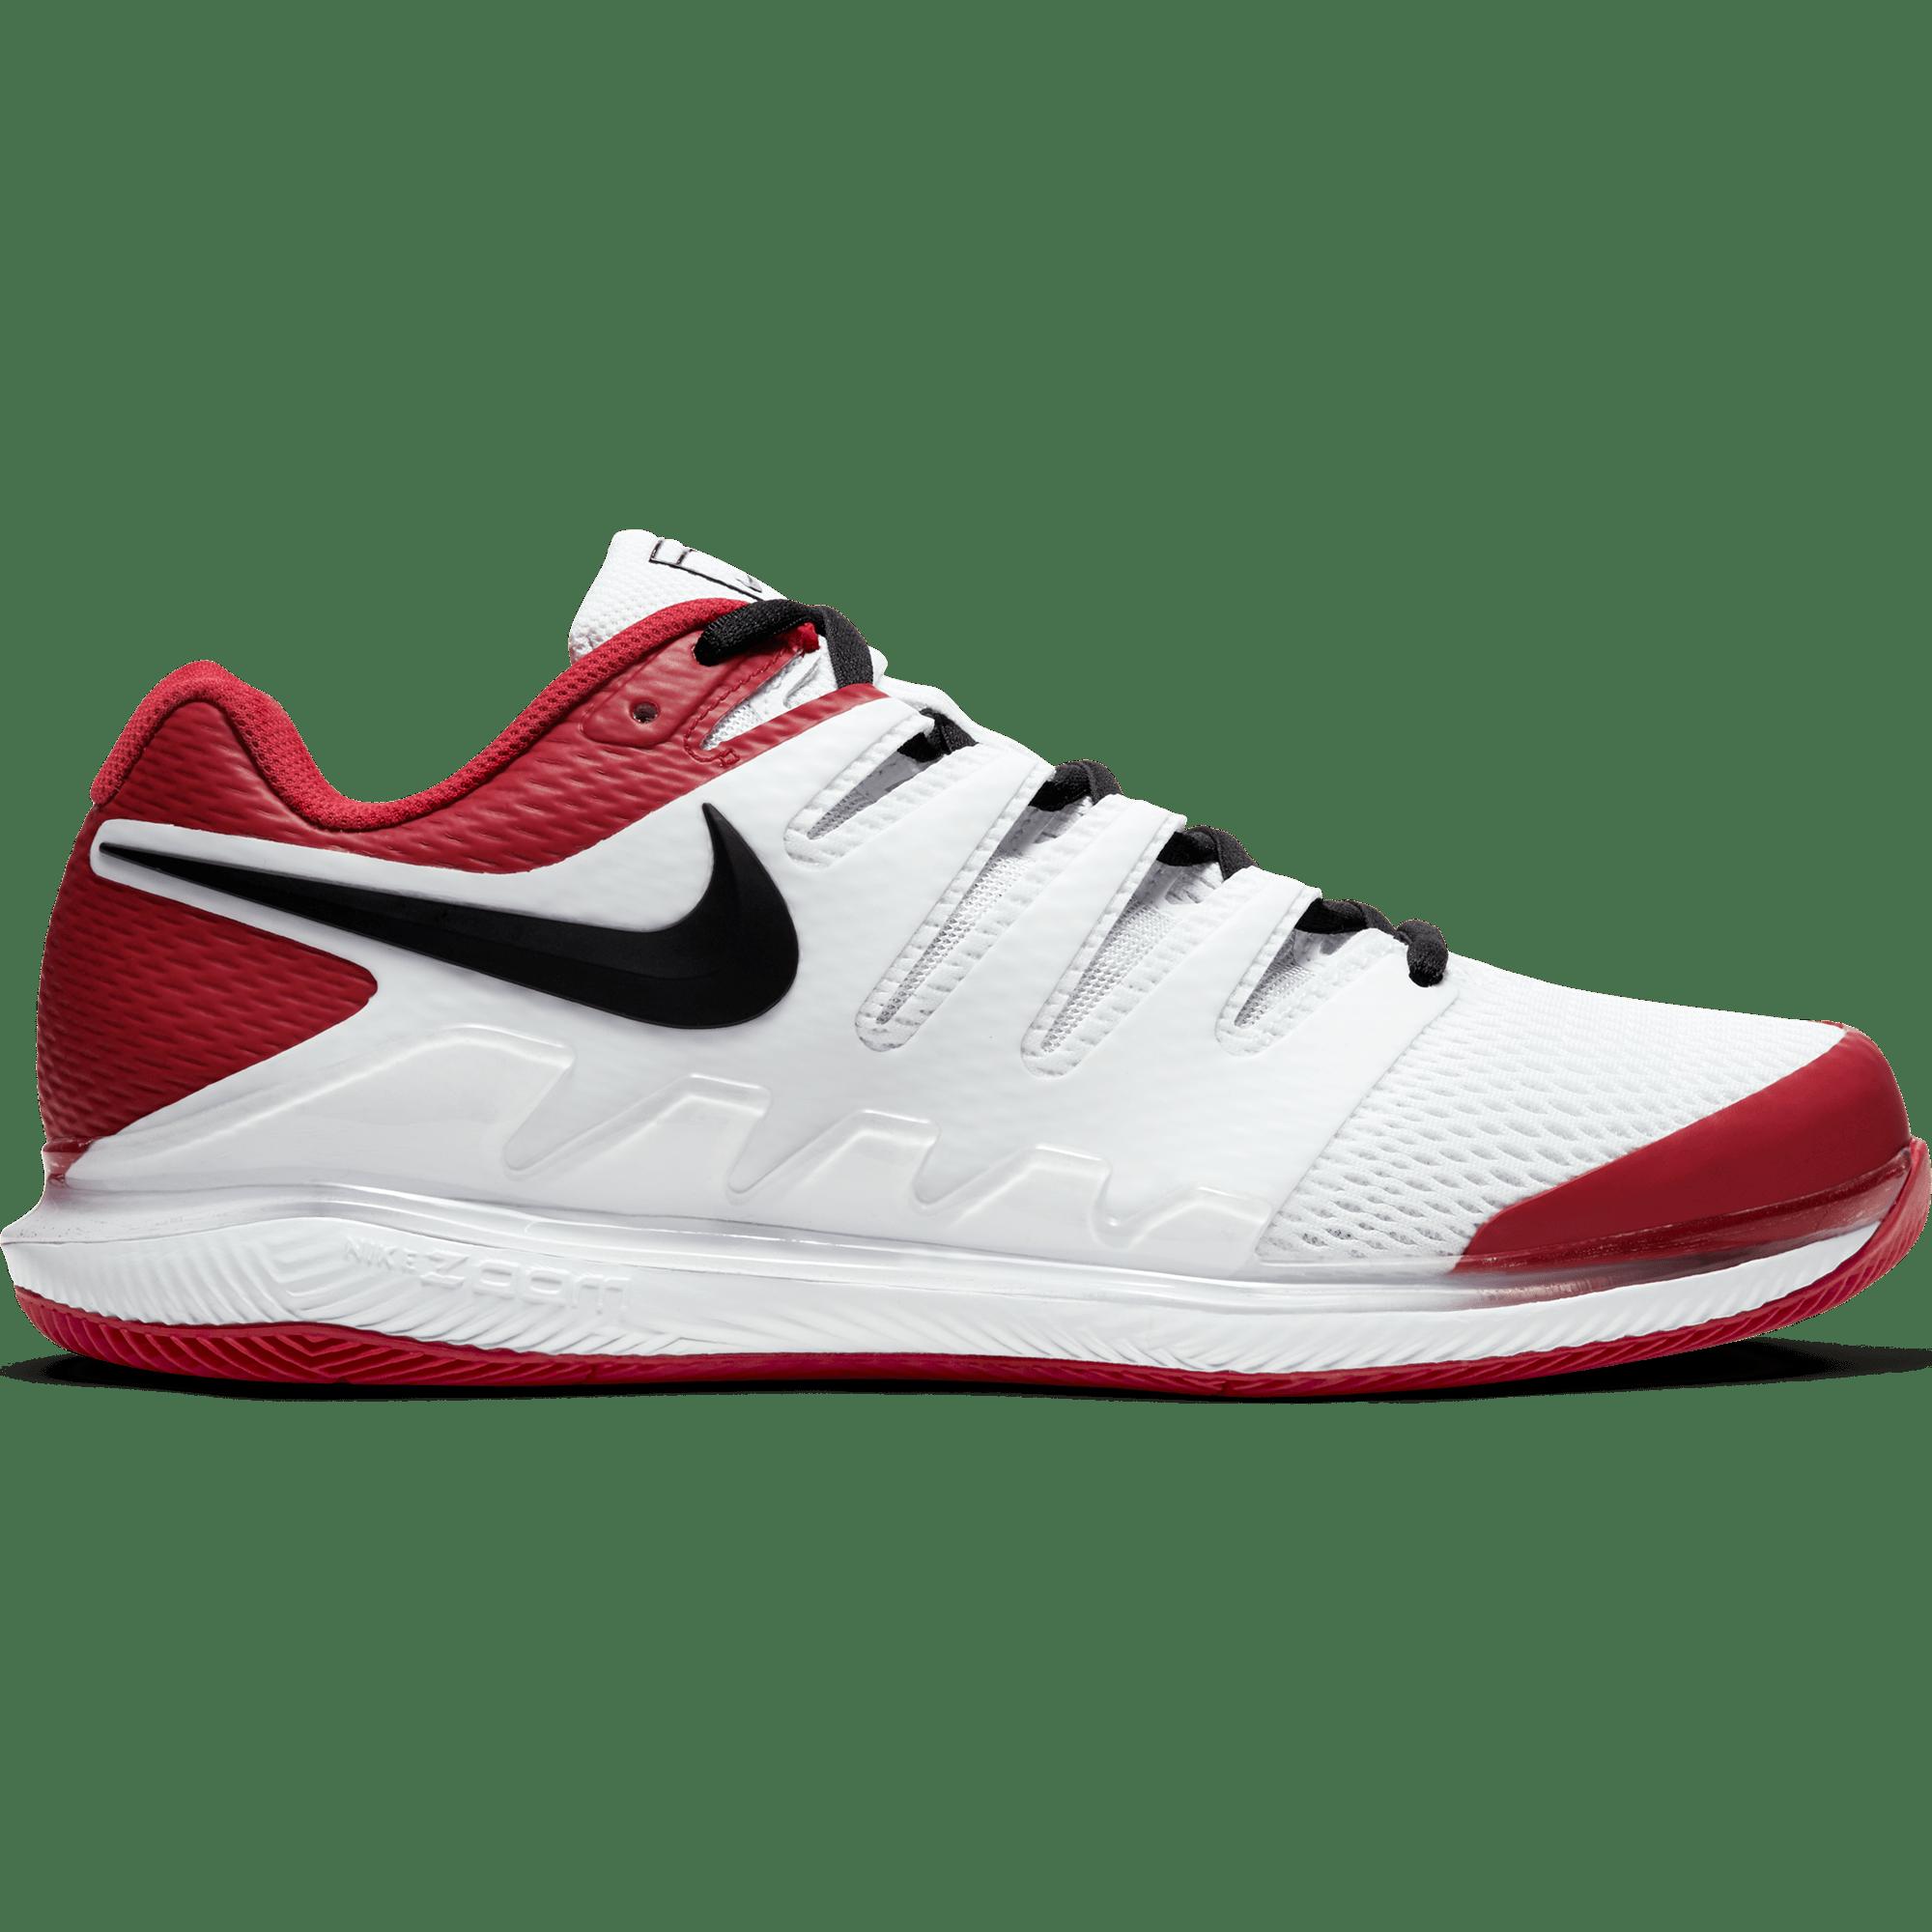 NikeCourt Air Zoom Vapor X Men's Hard